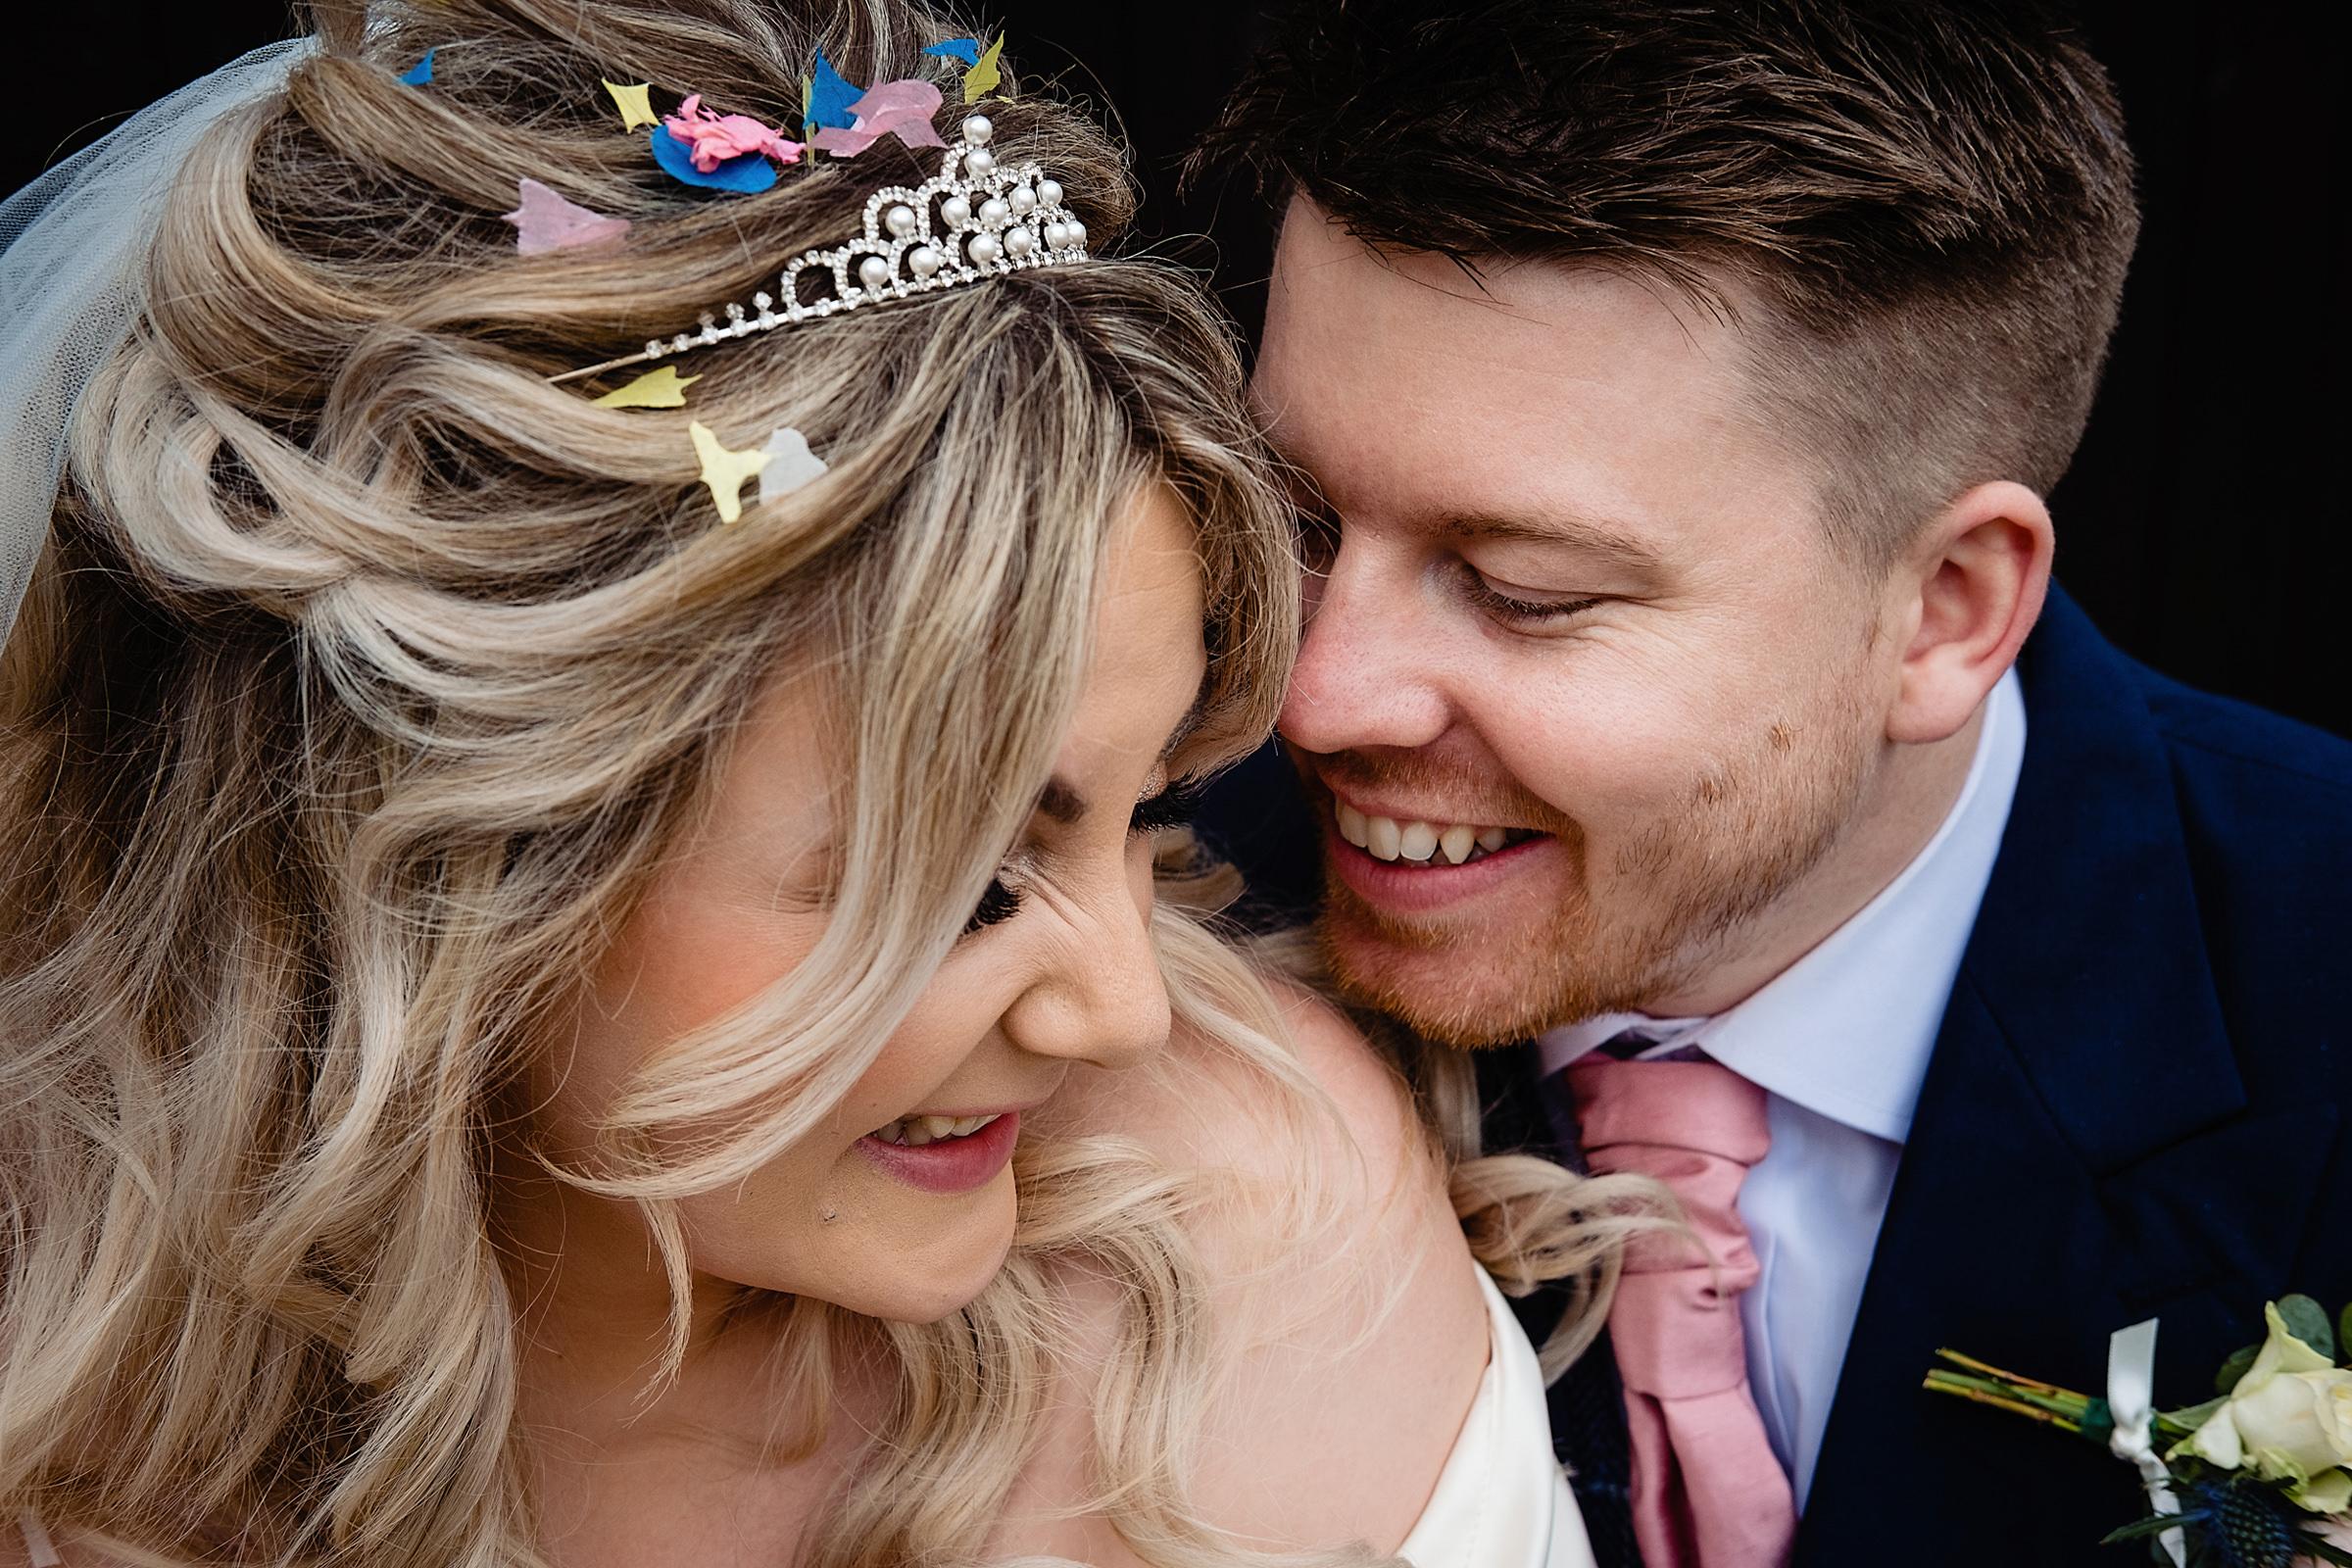 groom-snuggles-bride-wearing-tiara-with-confetti-emmaplusrich-england